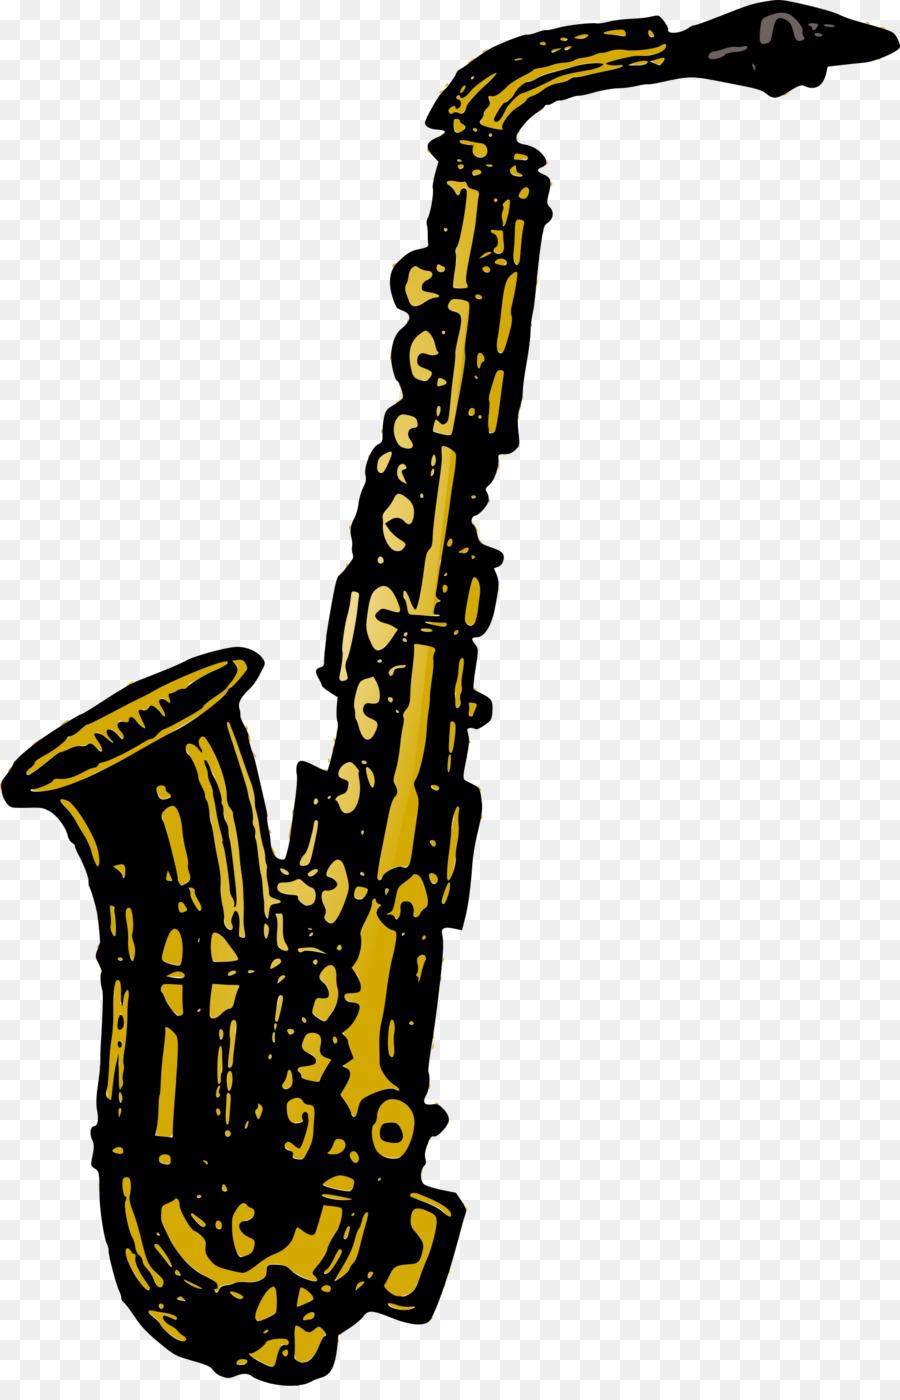 Saxofono clipart vector download Family Illustration clipart - Saxophone, Graphics ... vector download